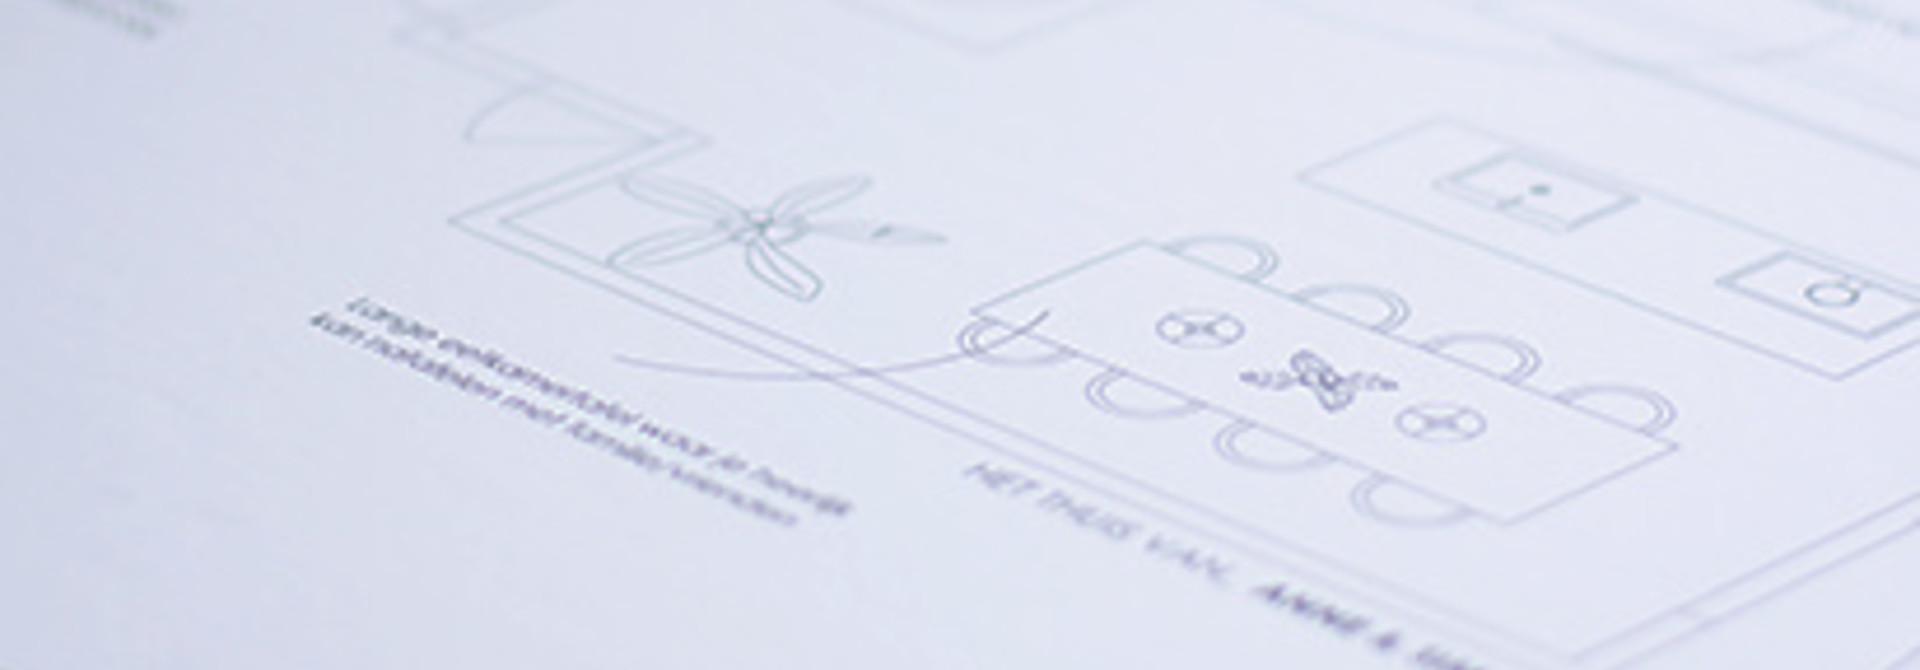 Design 2D plan